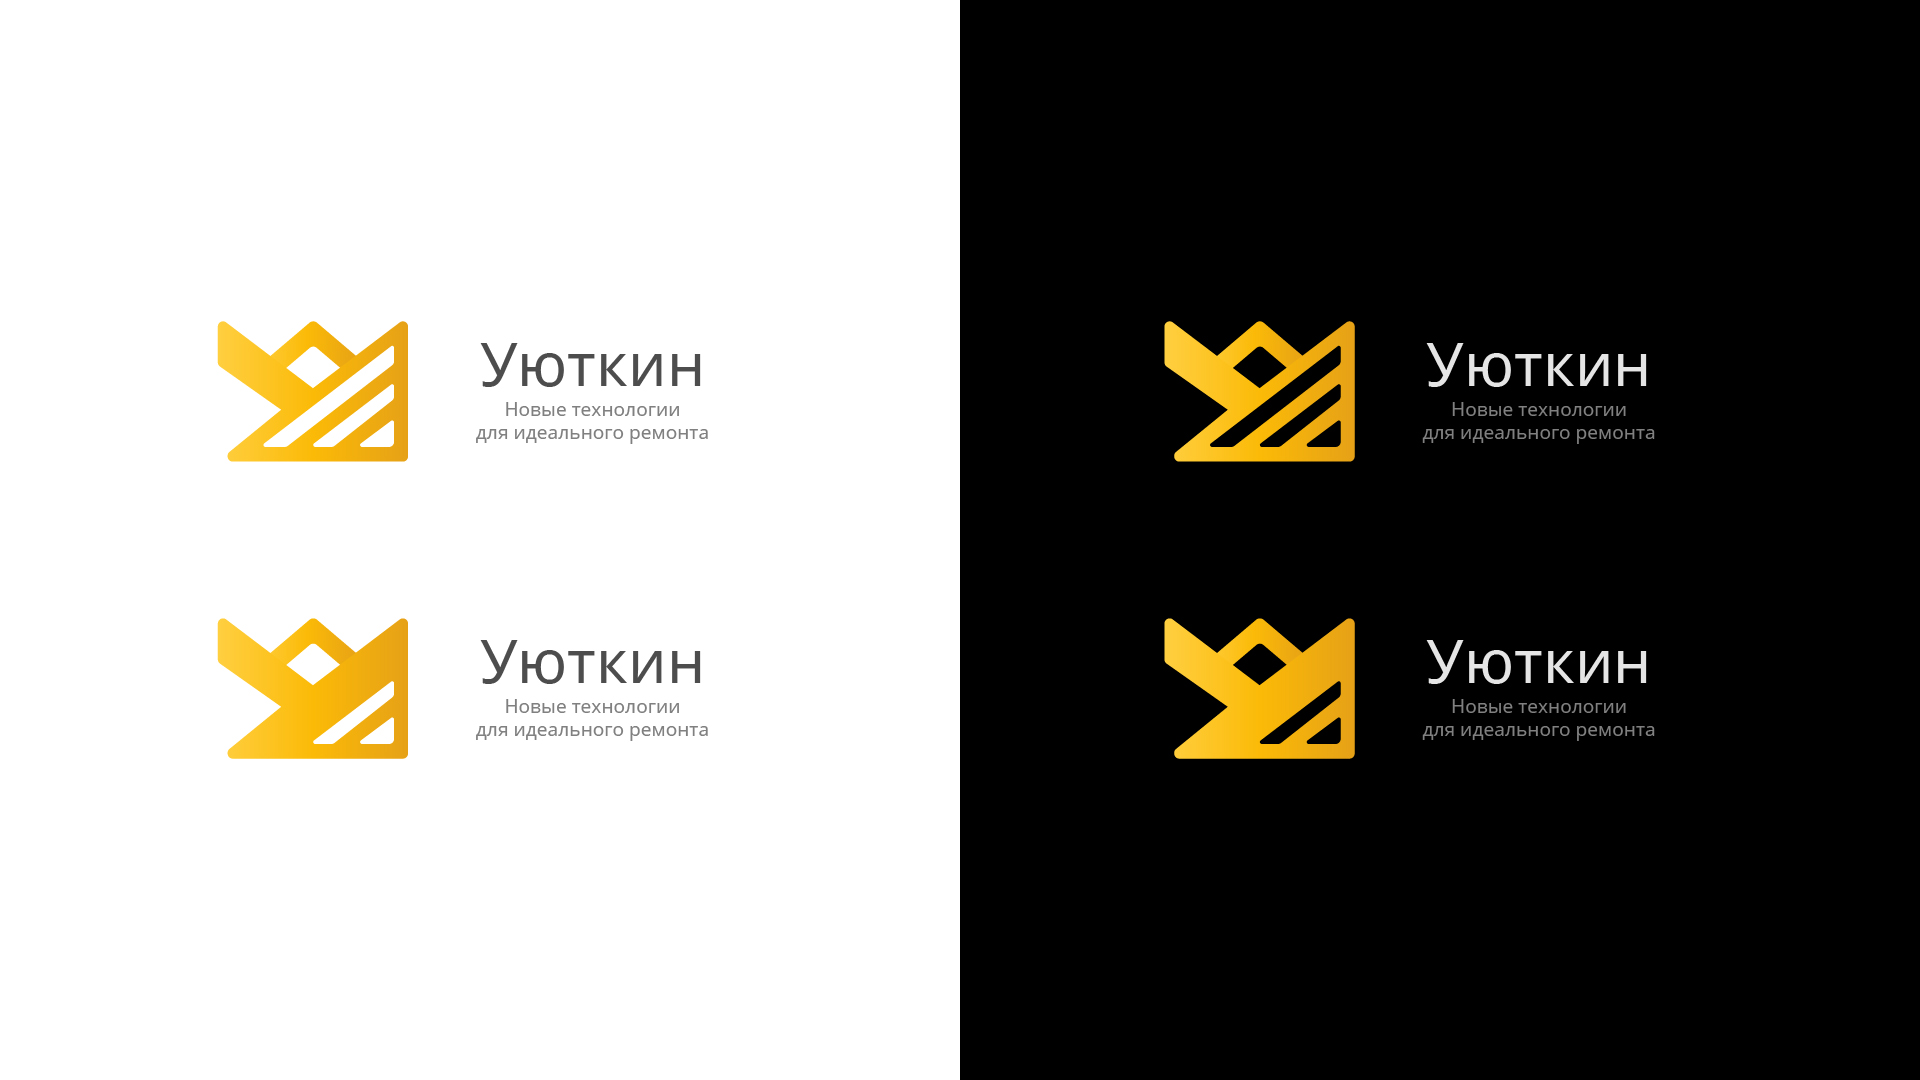 Создание логотипа и стиля сайта фото f_1085c6261dc9a63c.jpg